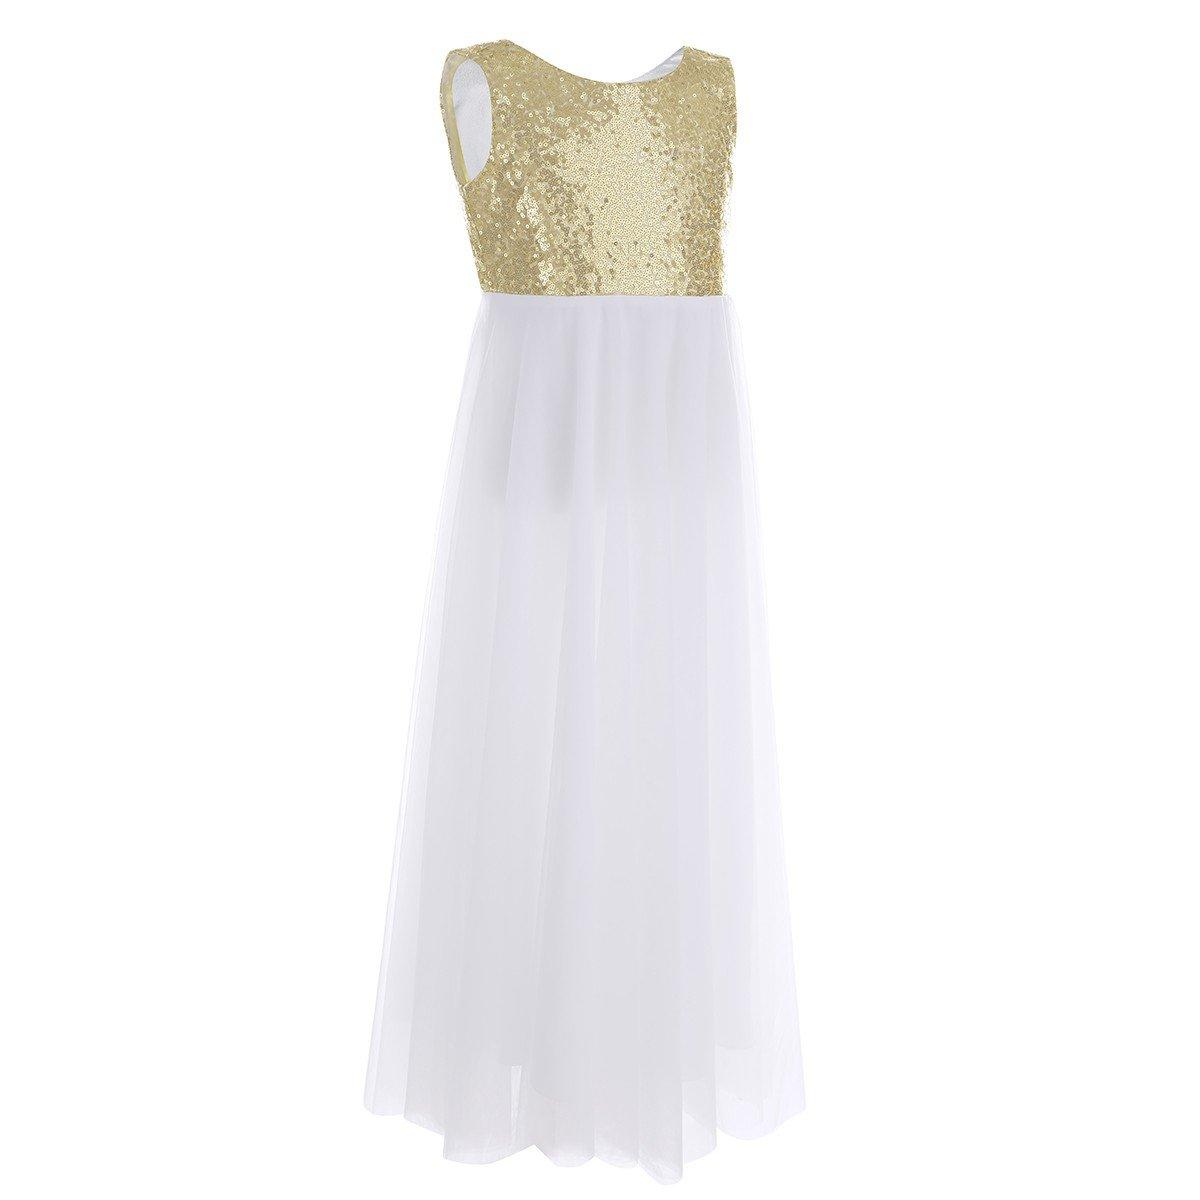 80752658e0876 Amazon.com  iiniim Junior Bridesmaid Dress Sequin Flower Girl Dress Formal  Wedding Pageant Party Prom Dance Ball Gowns  Clothing